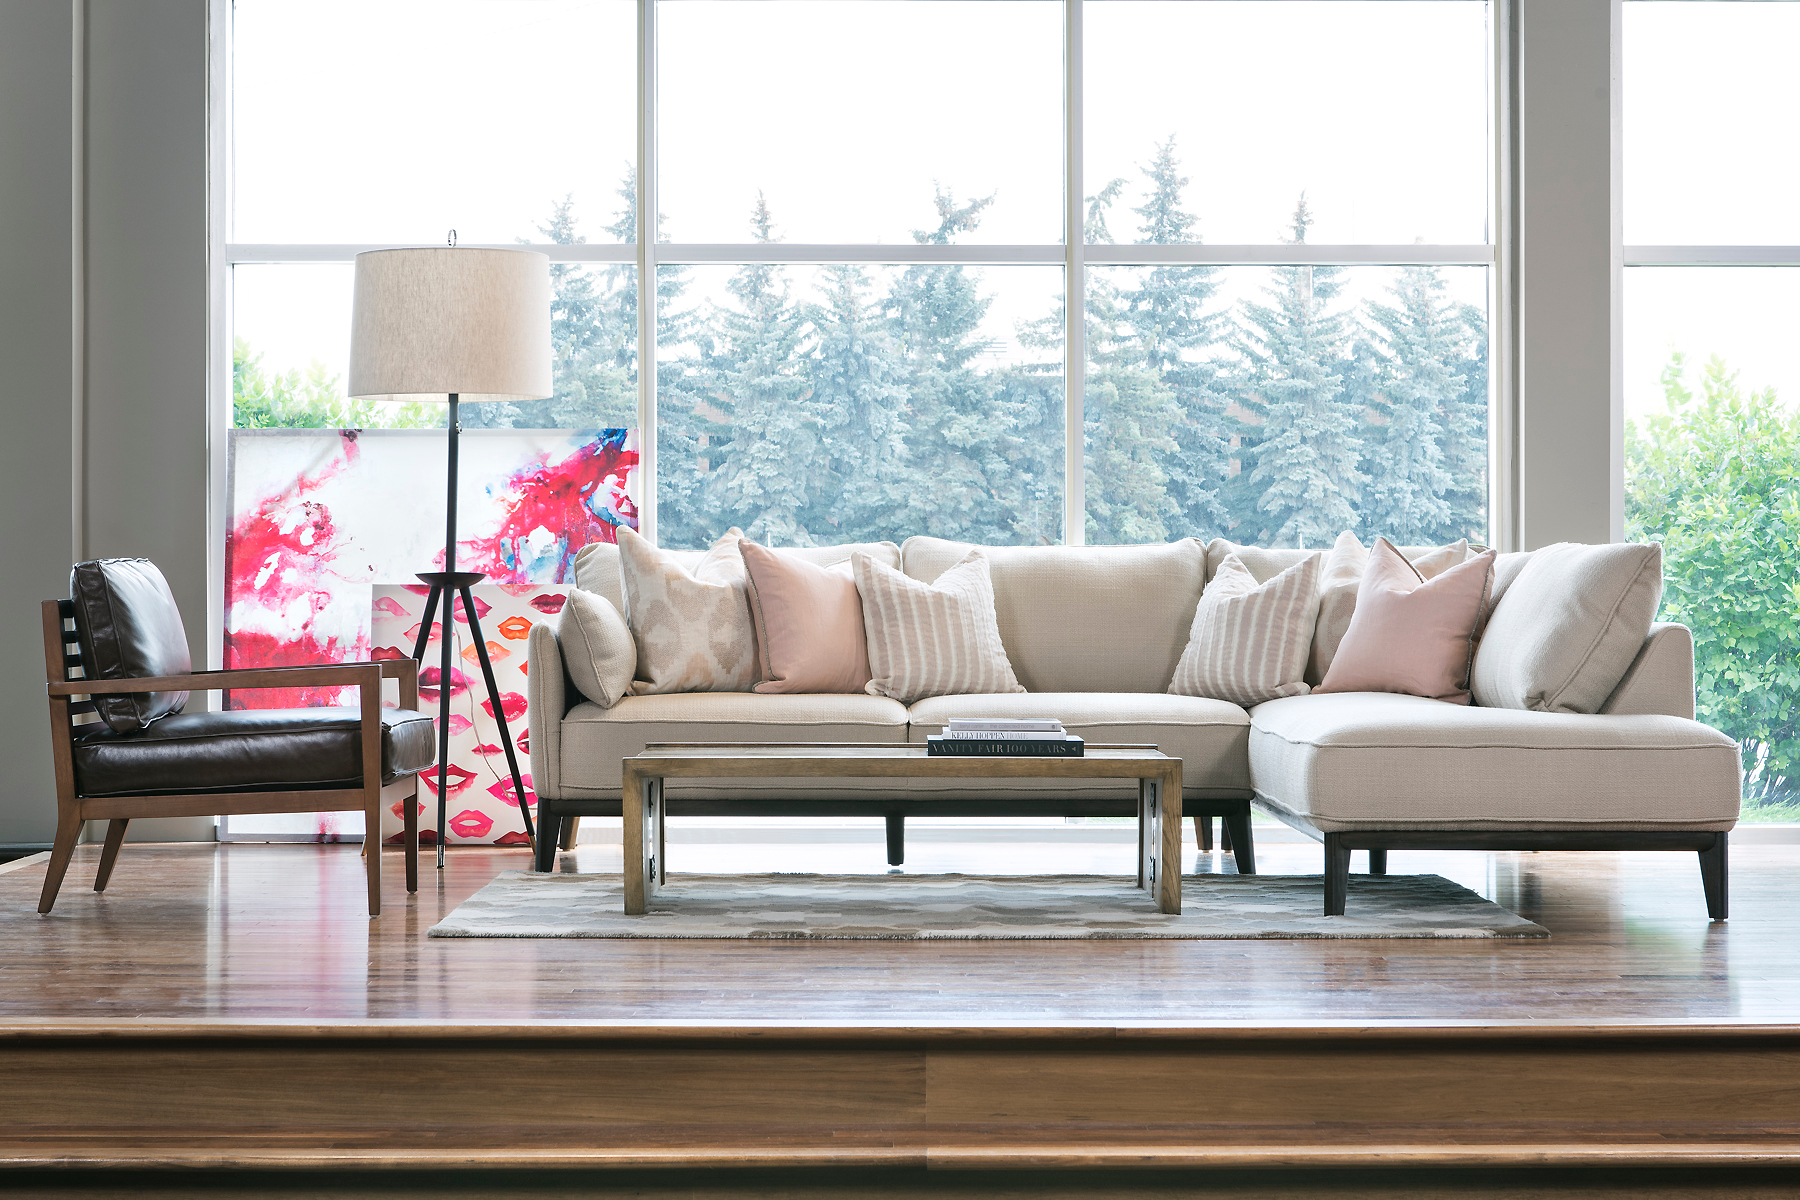 Home Evolution in Calgary